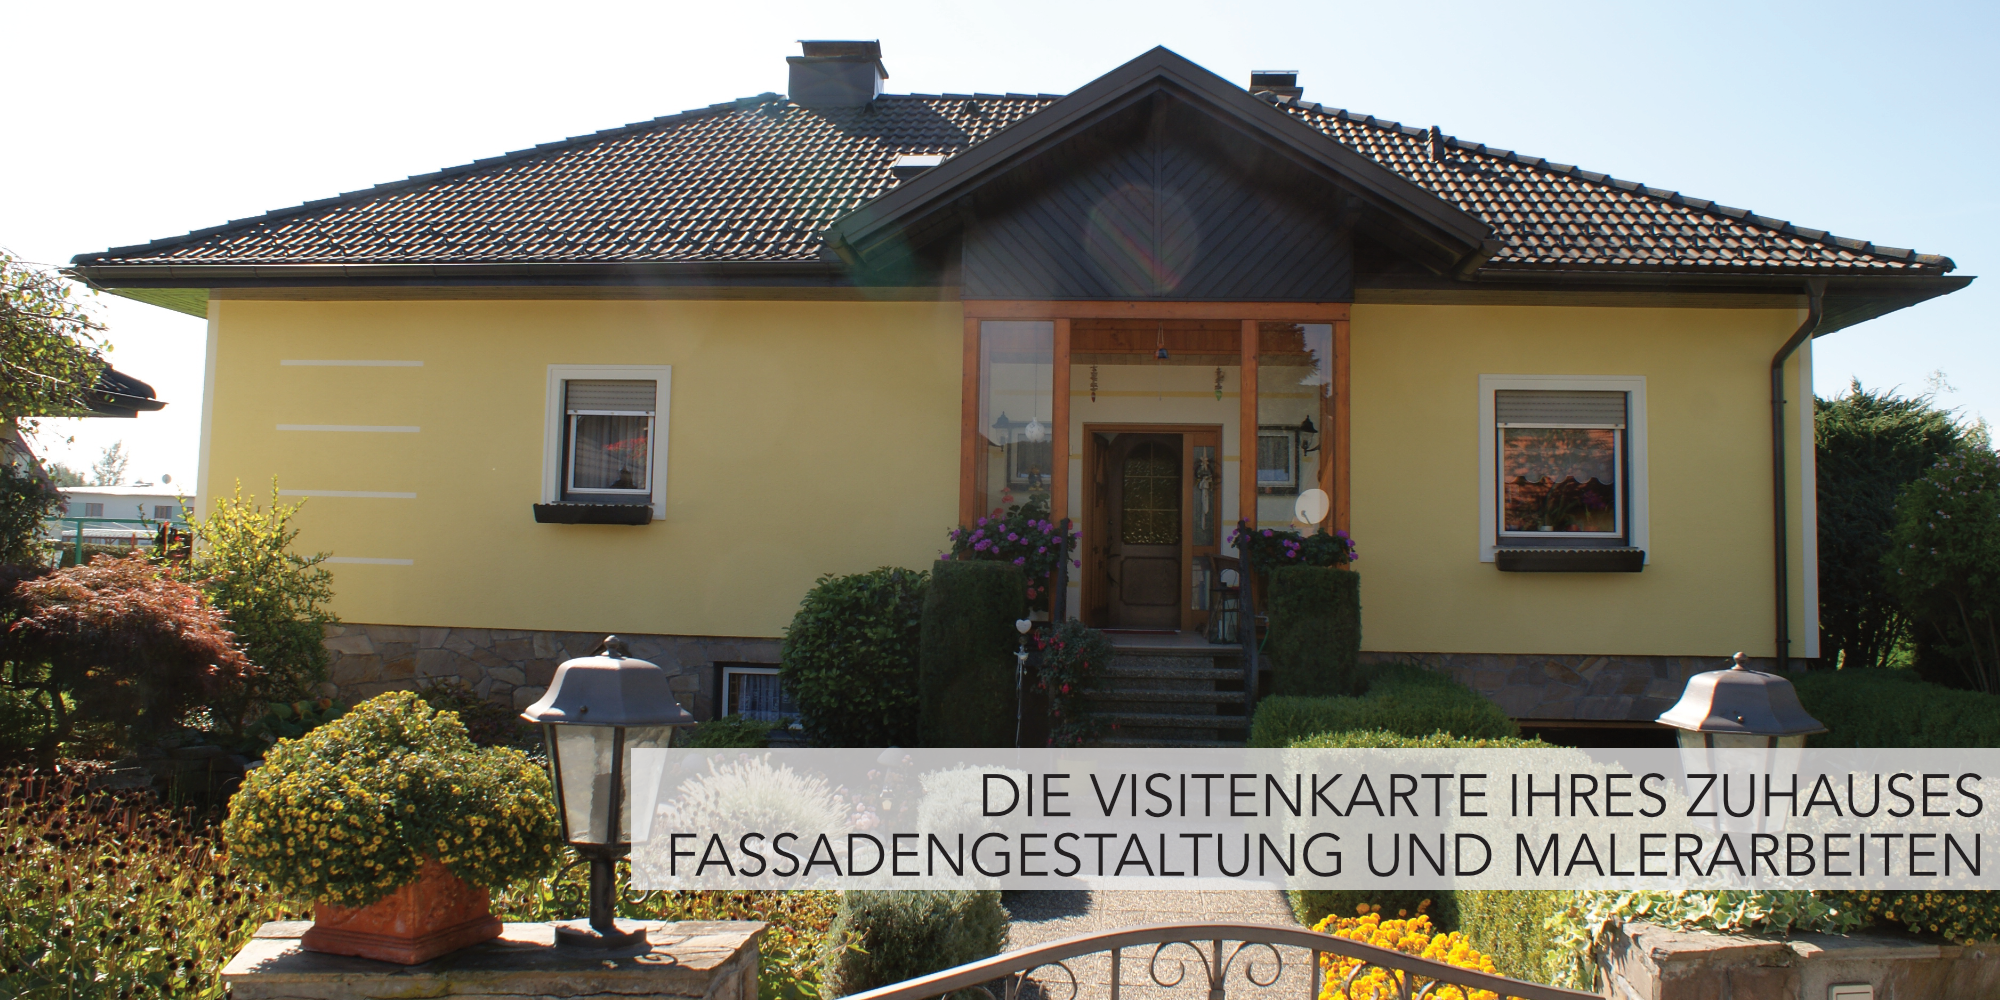 Fassadengestaltung, Wandmalerei, Schablonen Arbeiten -  Malerei Wagner Persenbeug